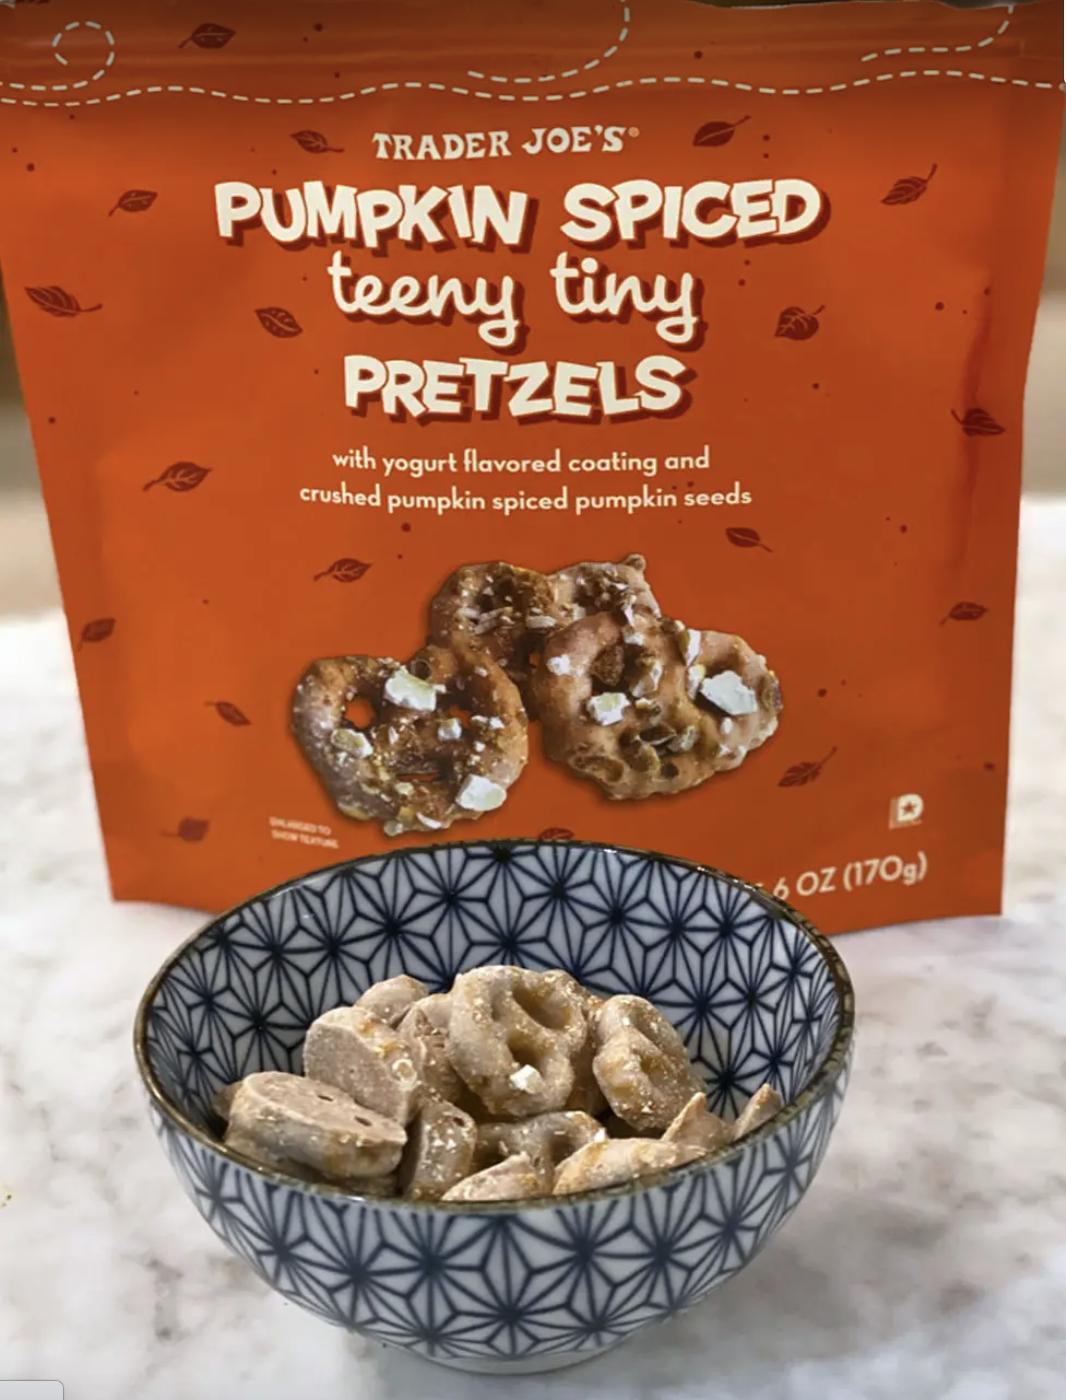 Pumpkin Spiced Teeny Tiny Pretzels